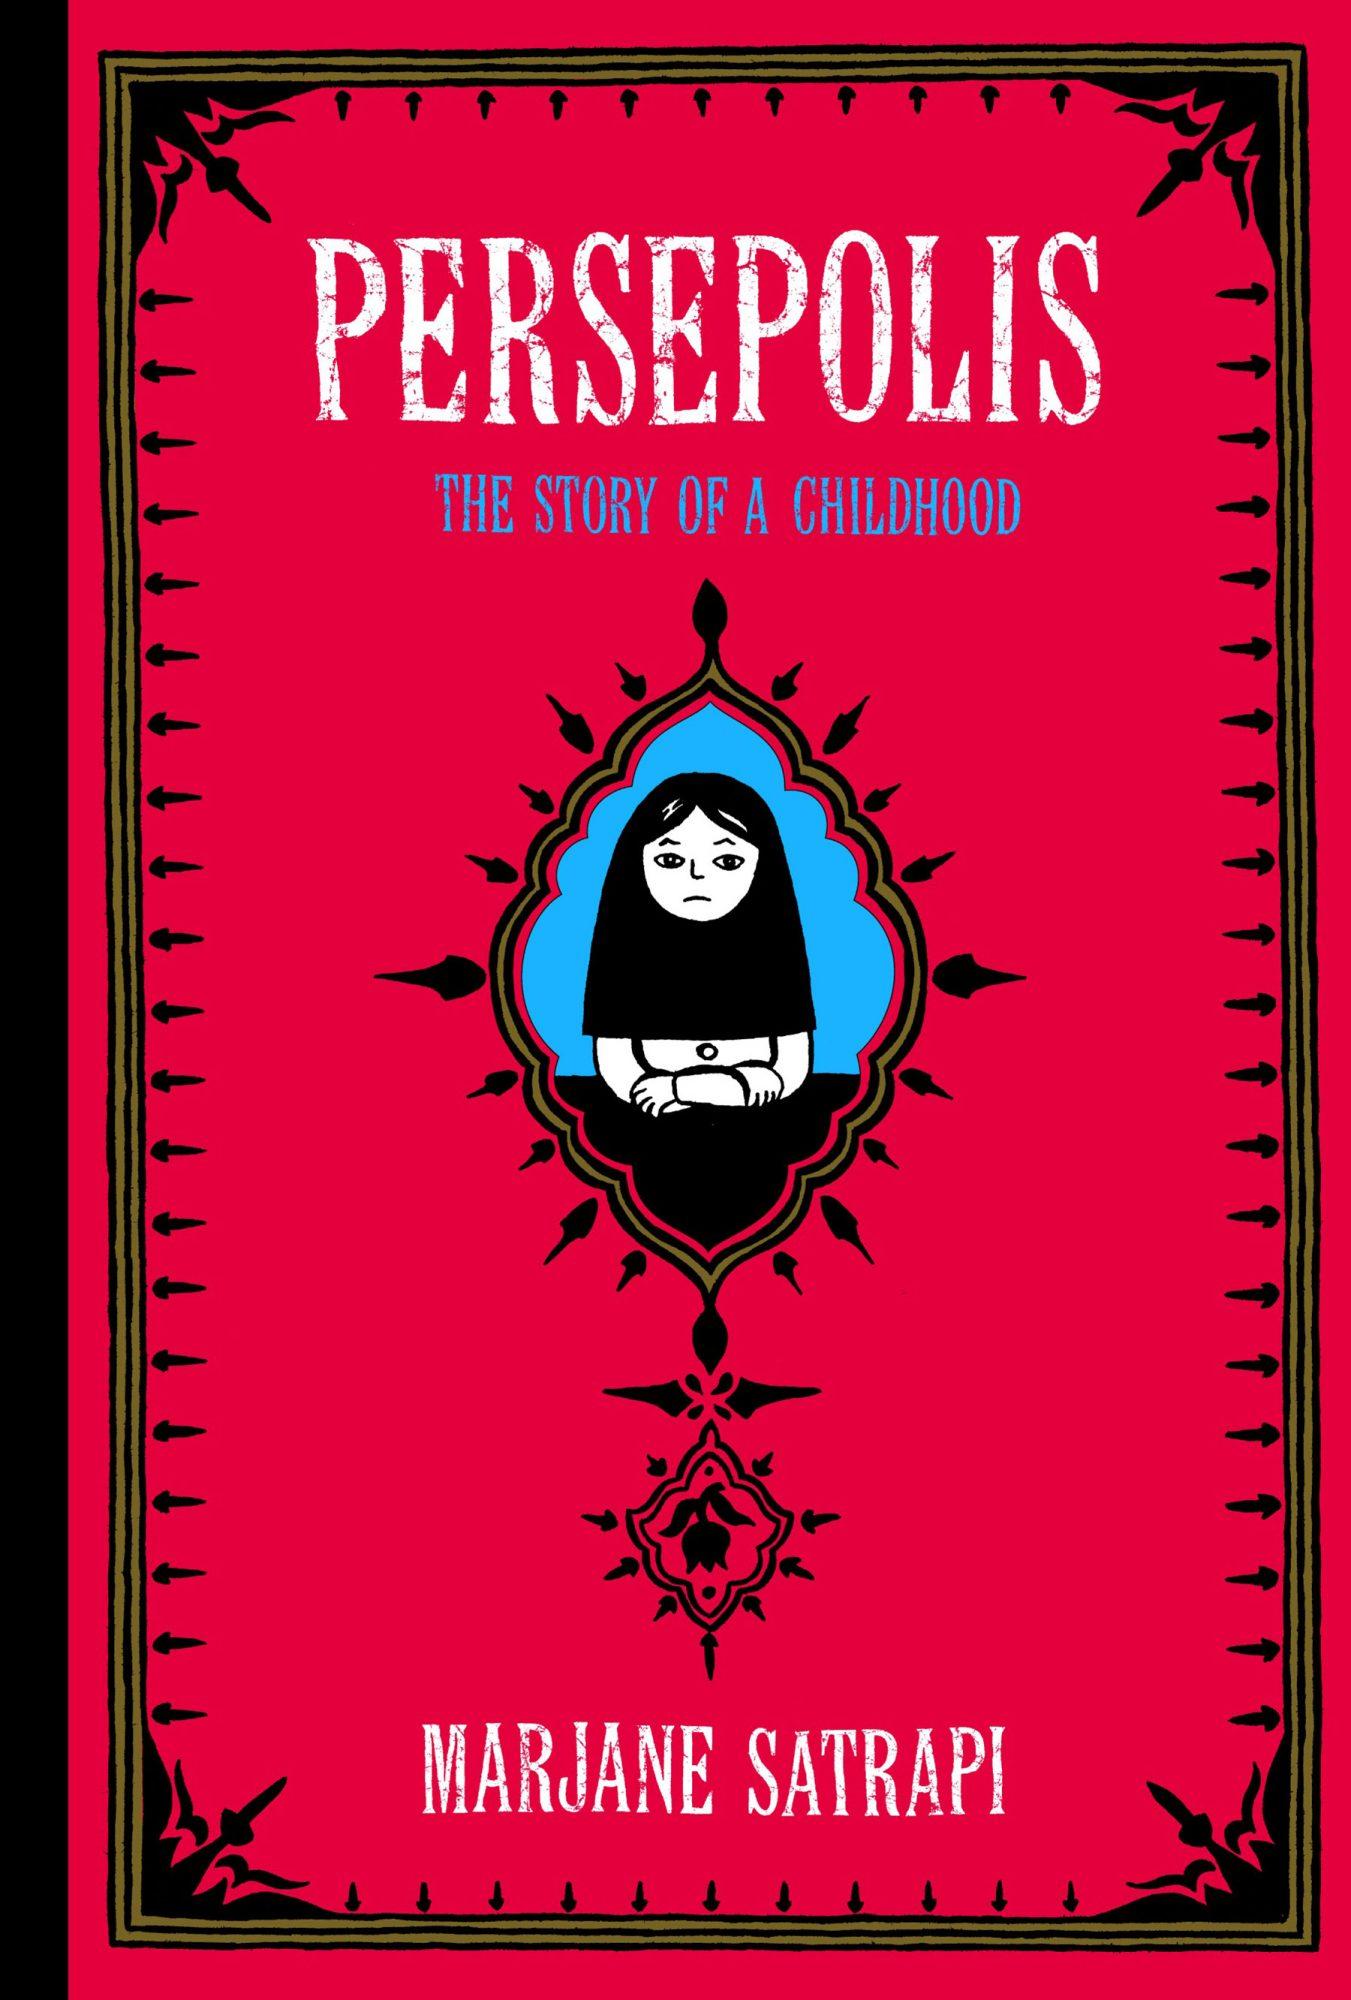 Persepolis: The Story of a Childhood (6/1/04) - paperbackby Marjane Satrapi